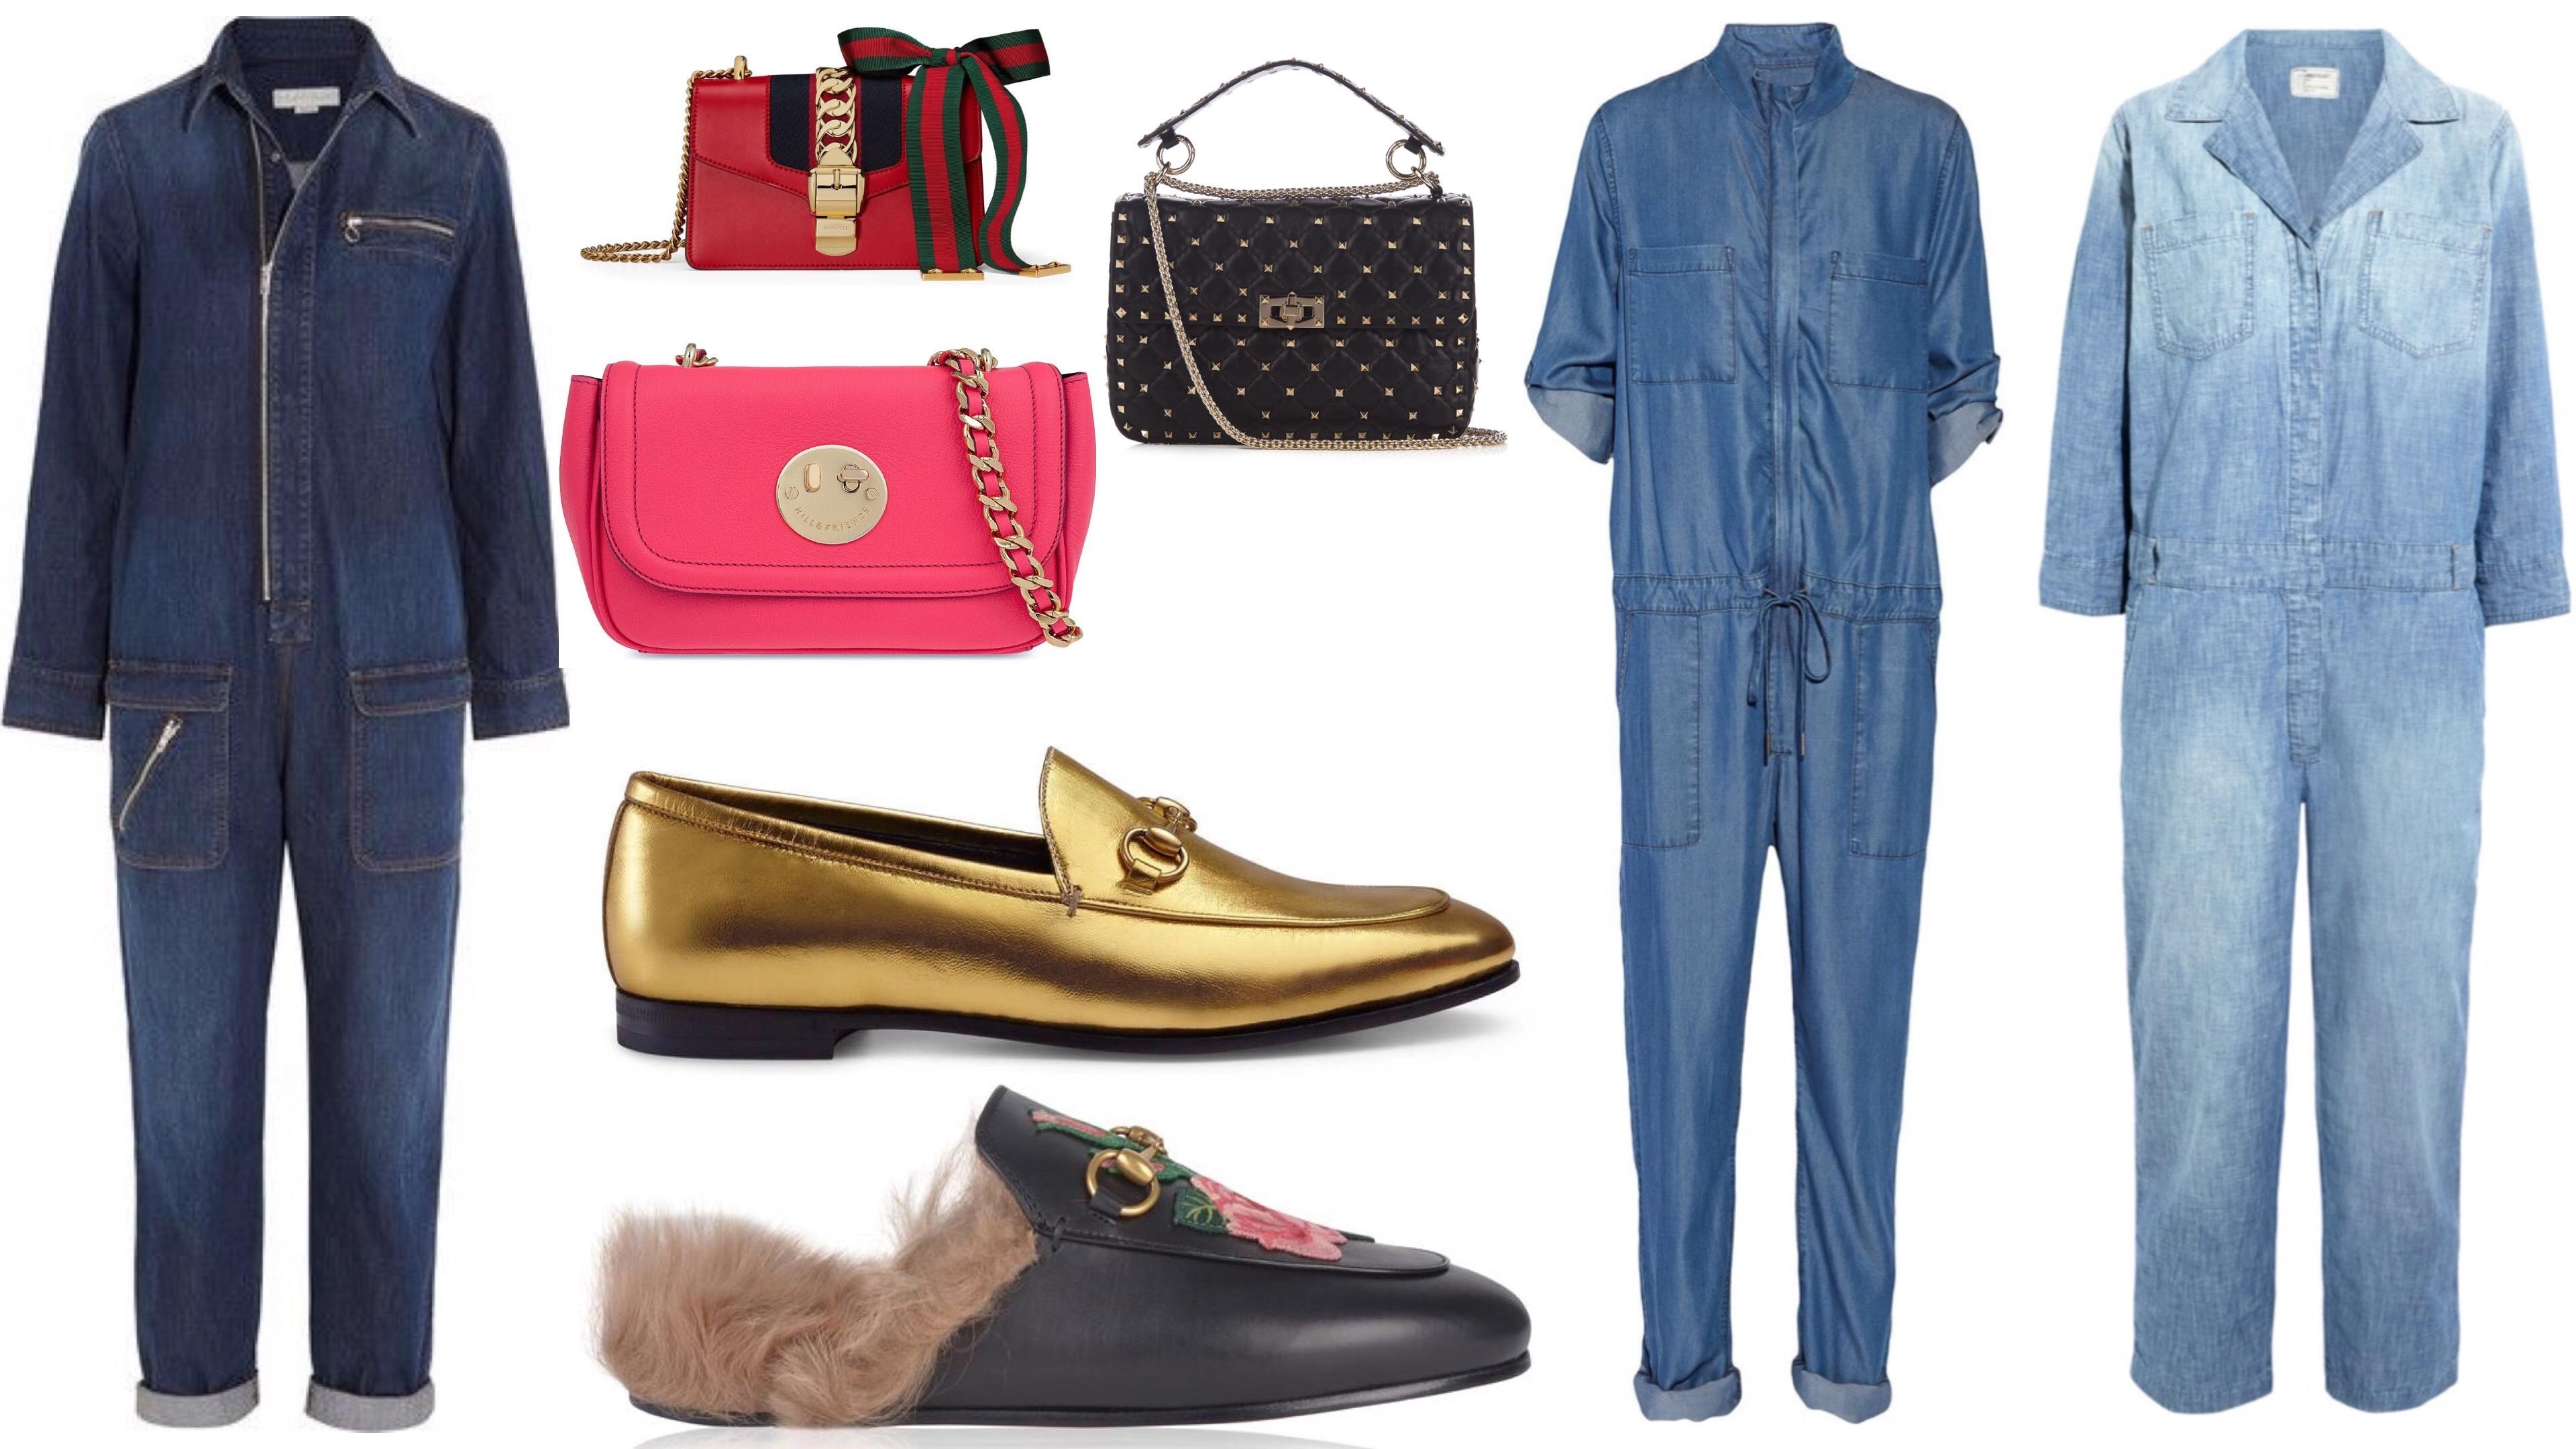 Denim Jumpsuits gucci loafers gucci handbags